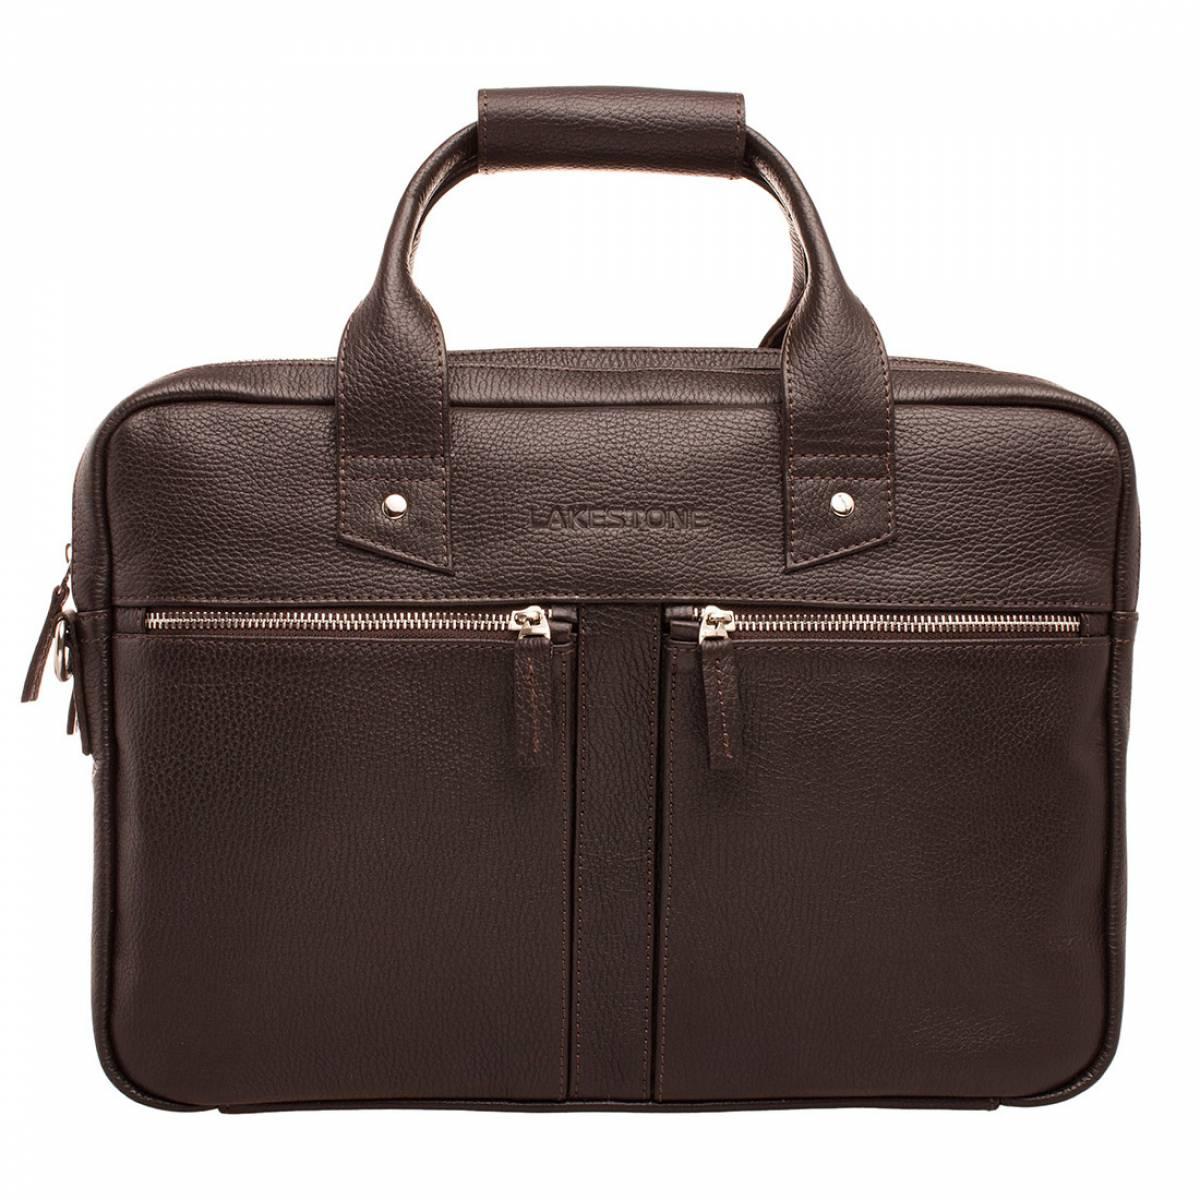 Деловая сумка Kelston Brown фото